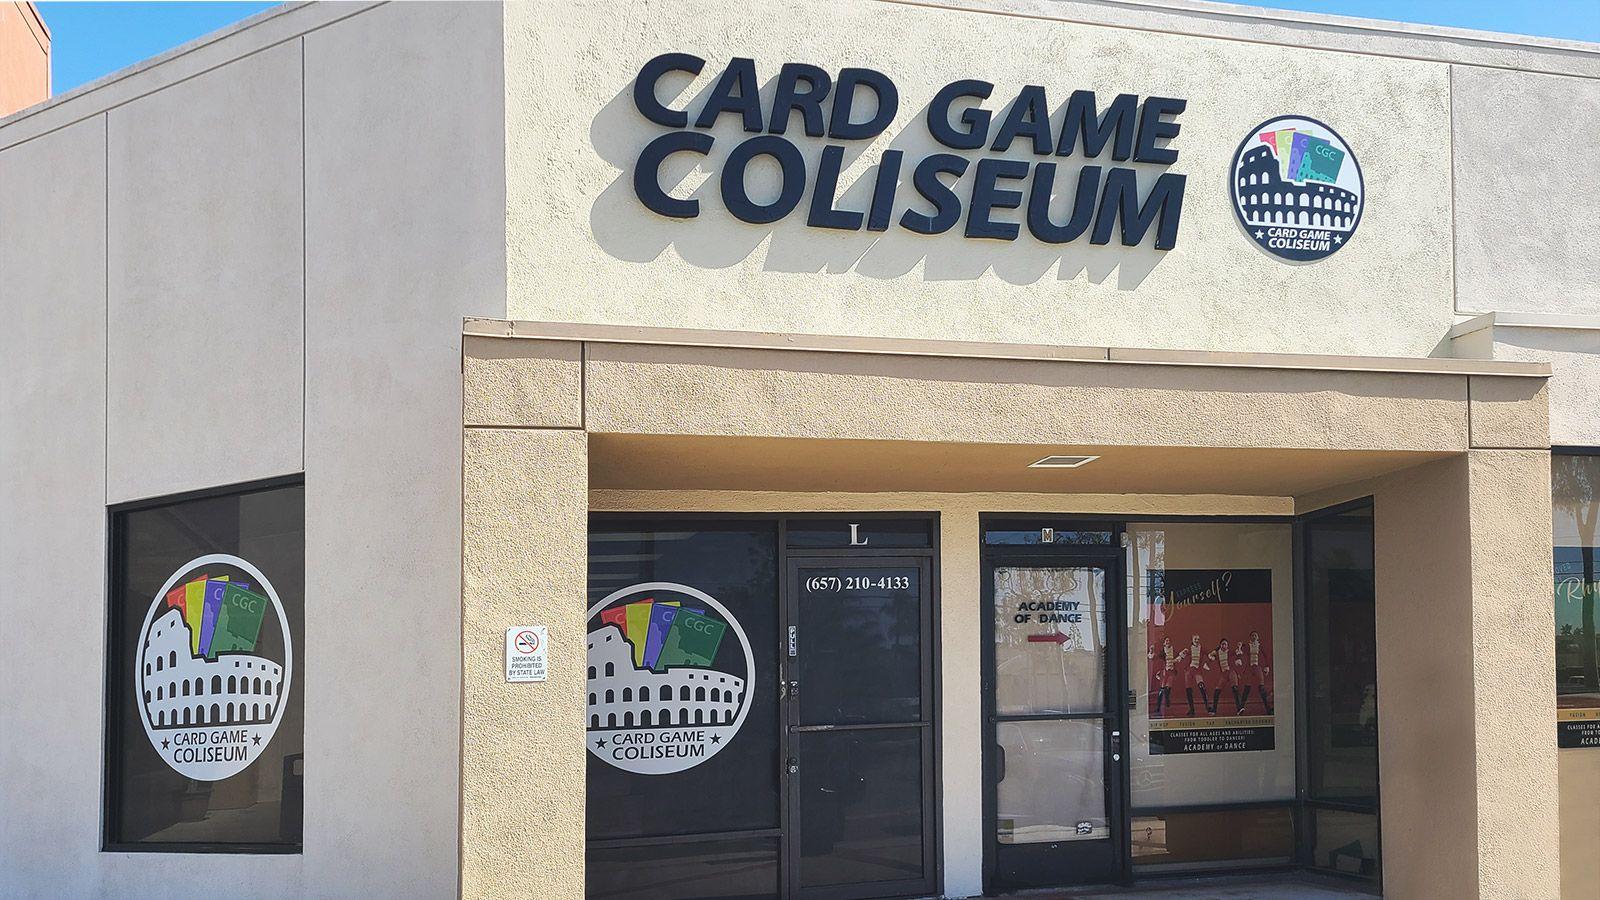 Card Game Coliseum decals